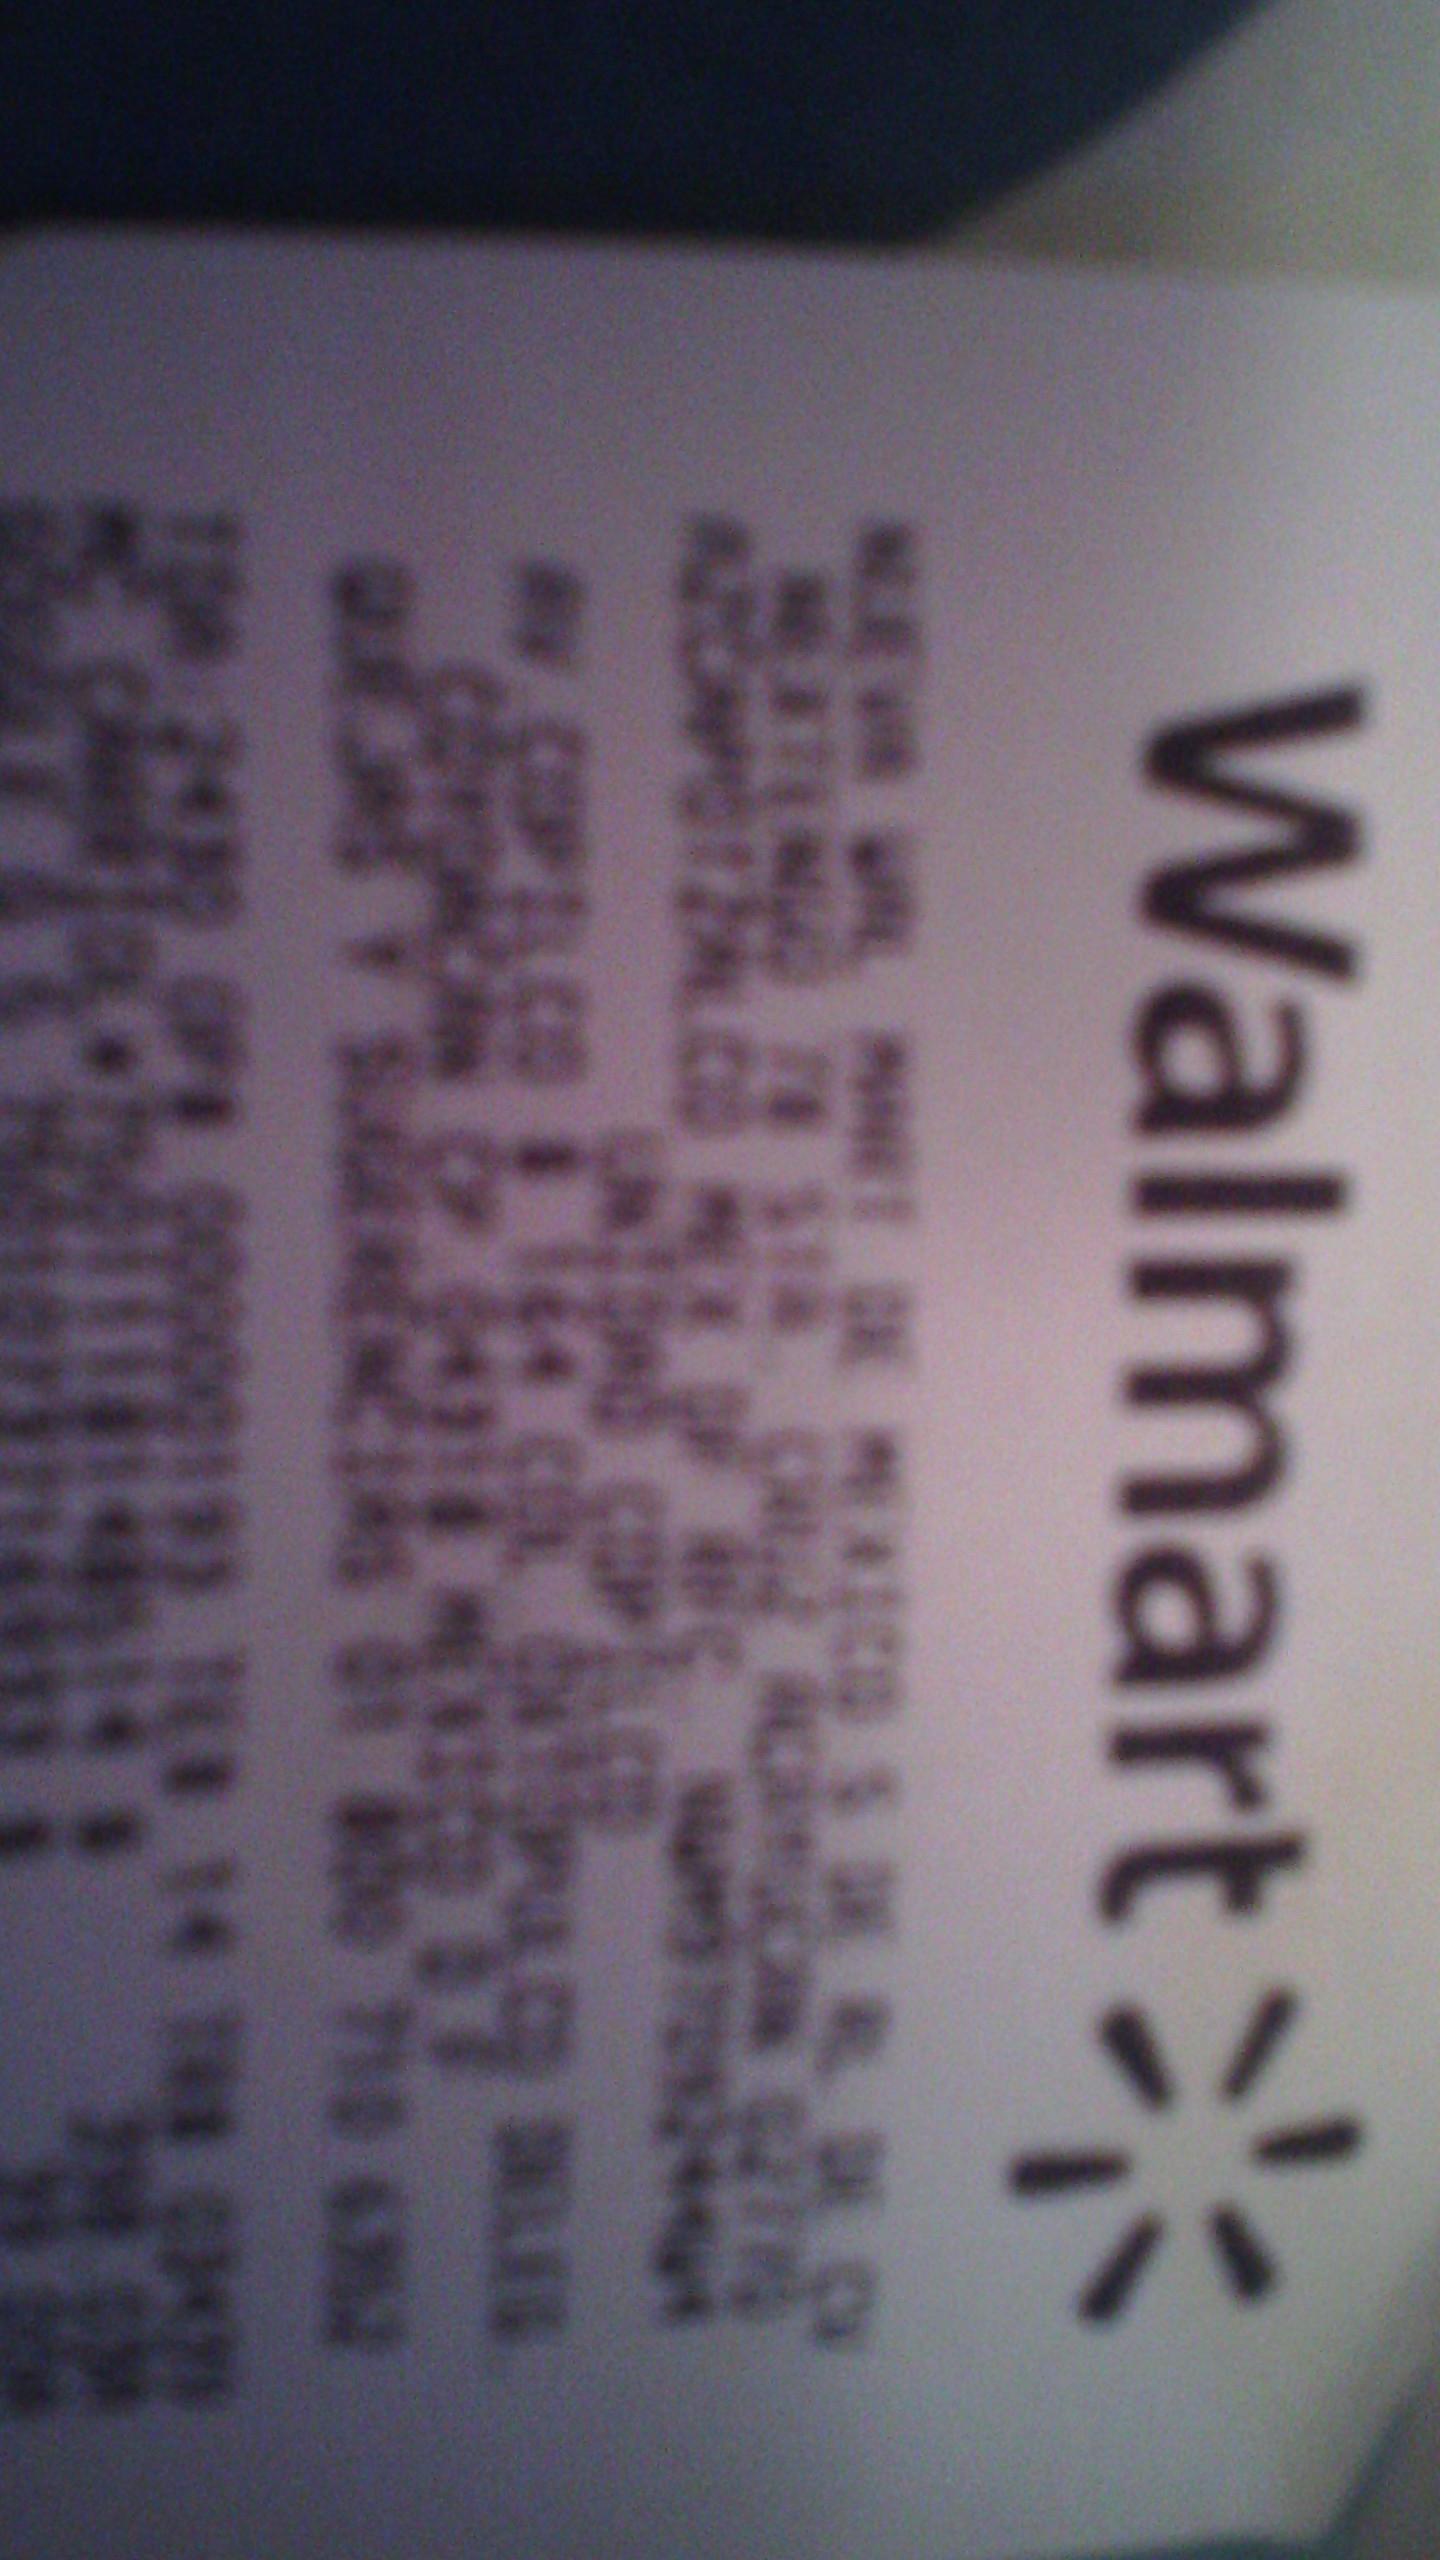 Walmart: Carreola infanti a $398.03